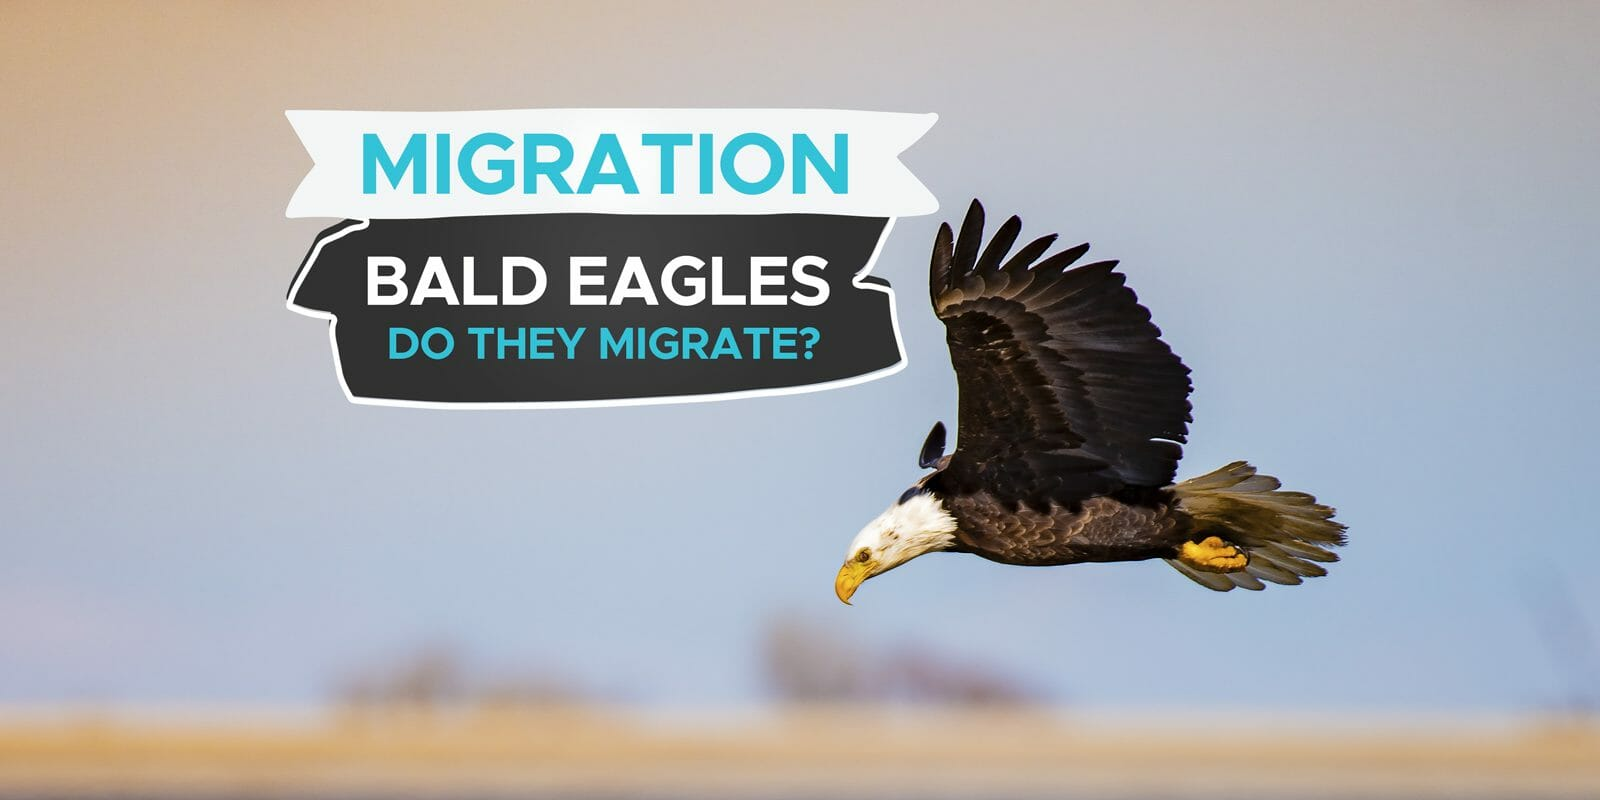 do bald eagles migrate